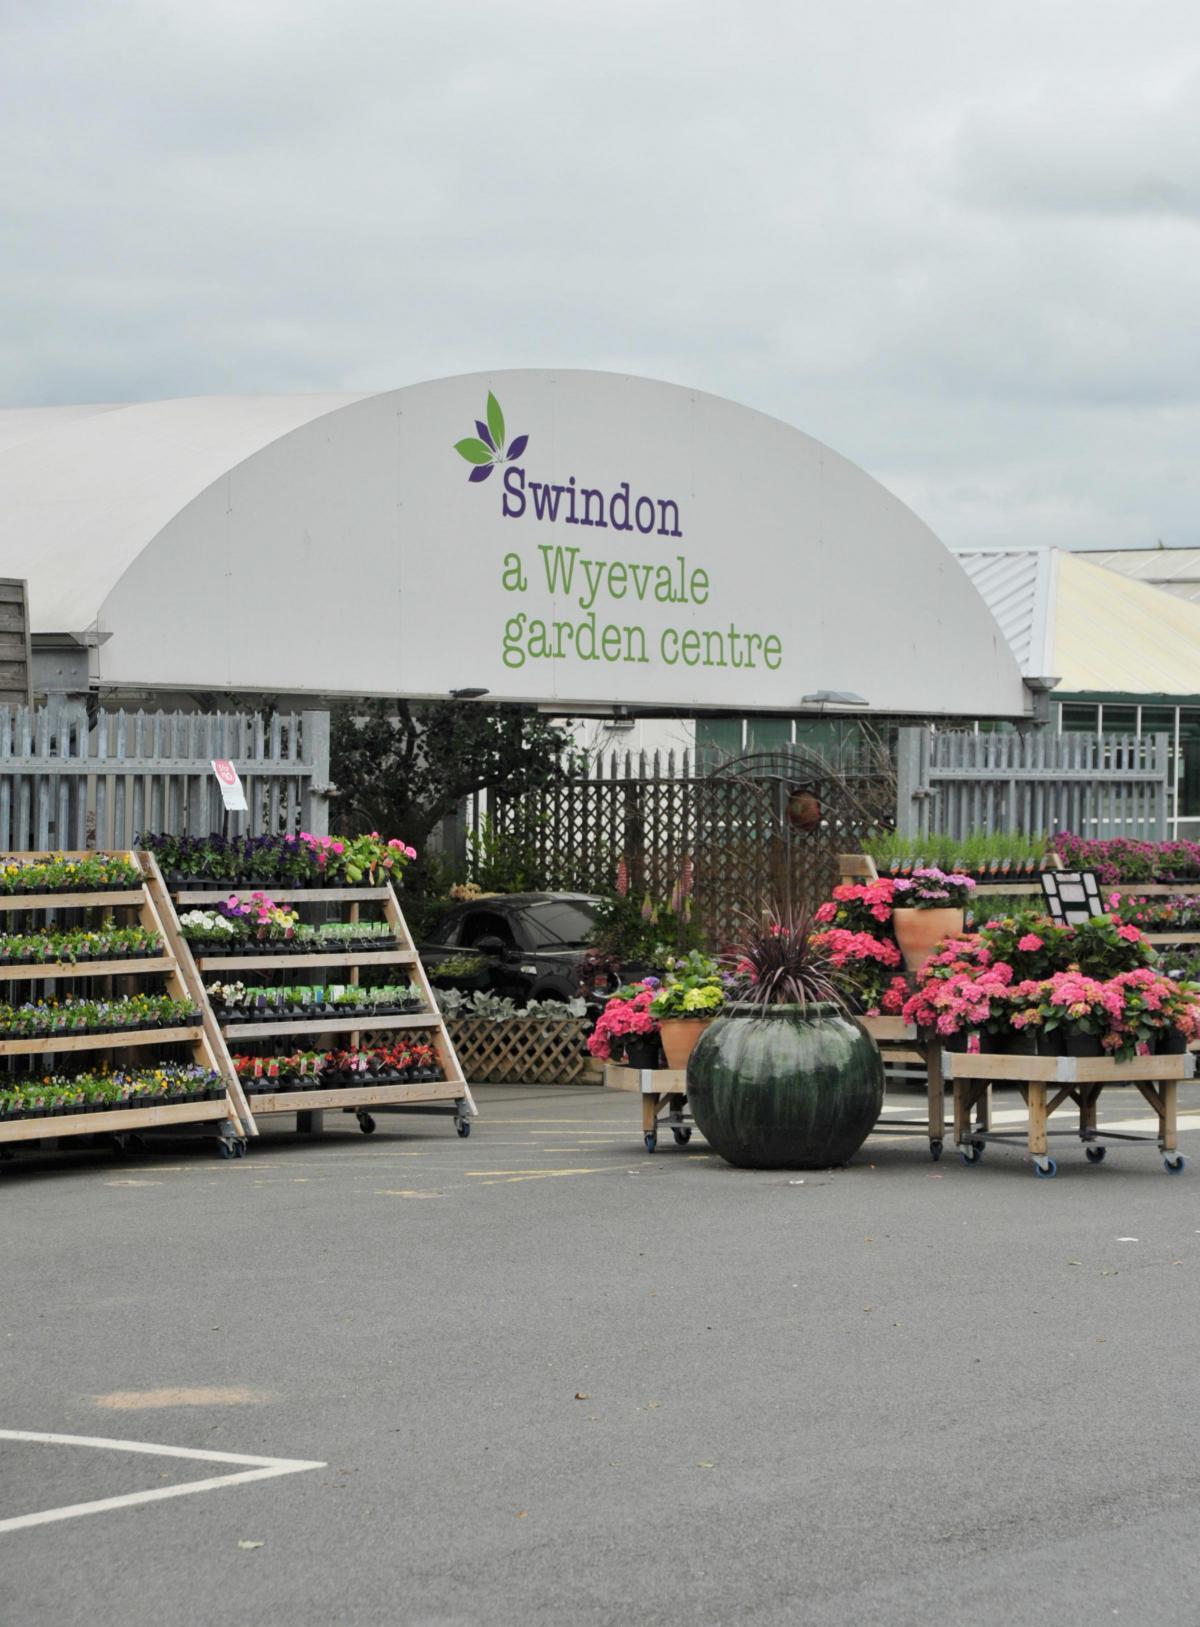 New Cotton Traders leisurewear shop opens in Swindon Garden